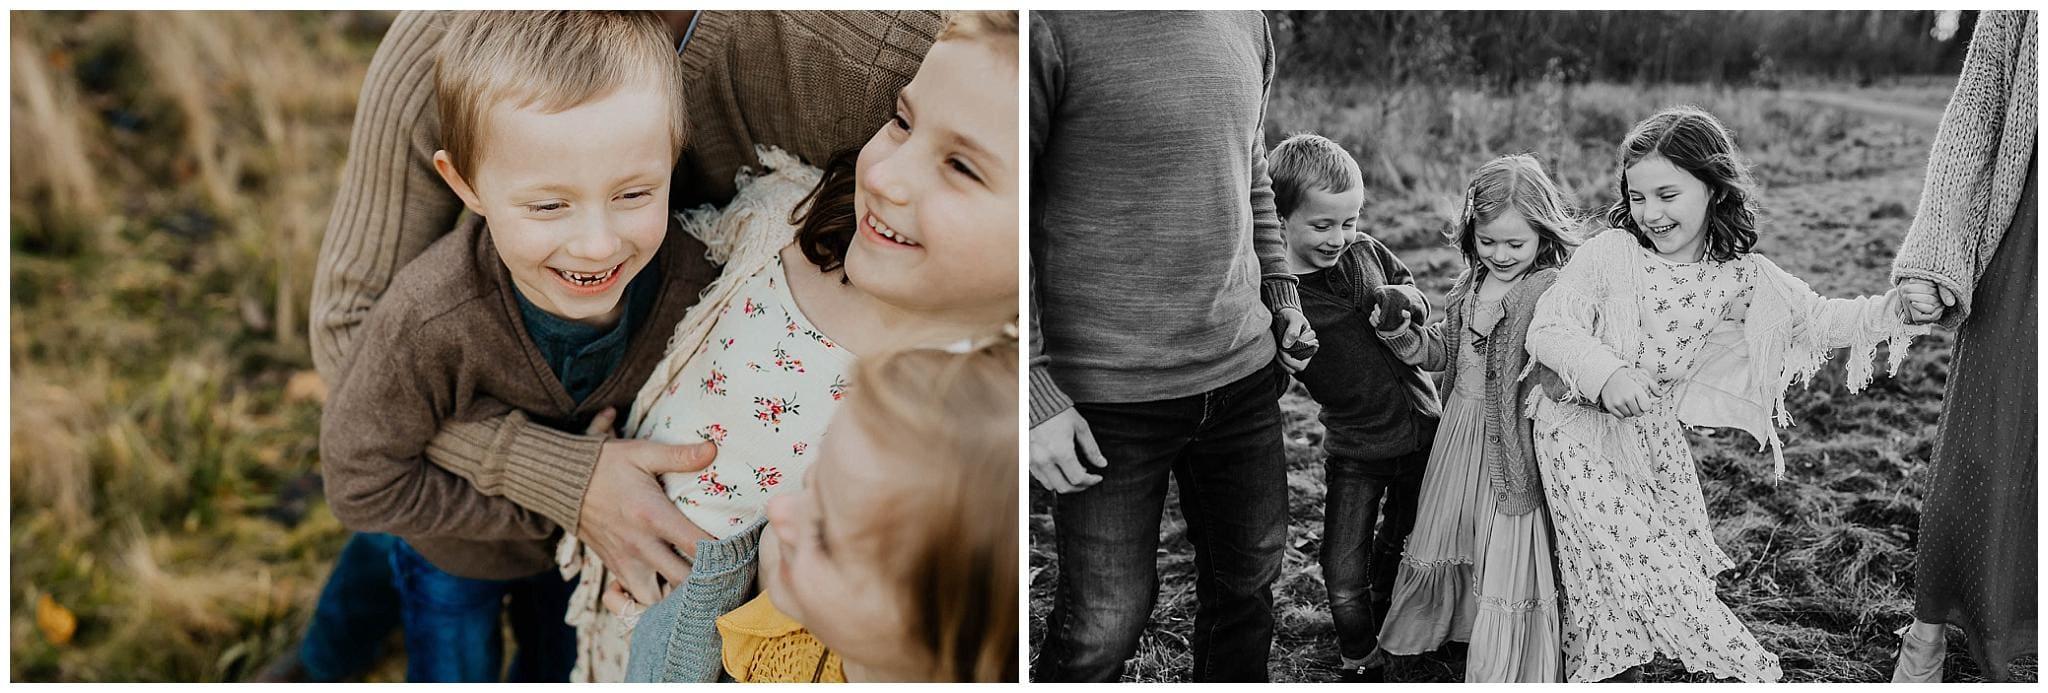 best portland family photographer